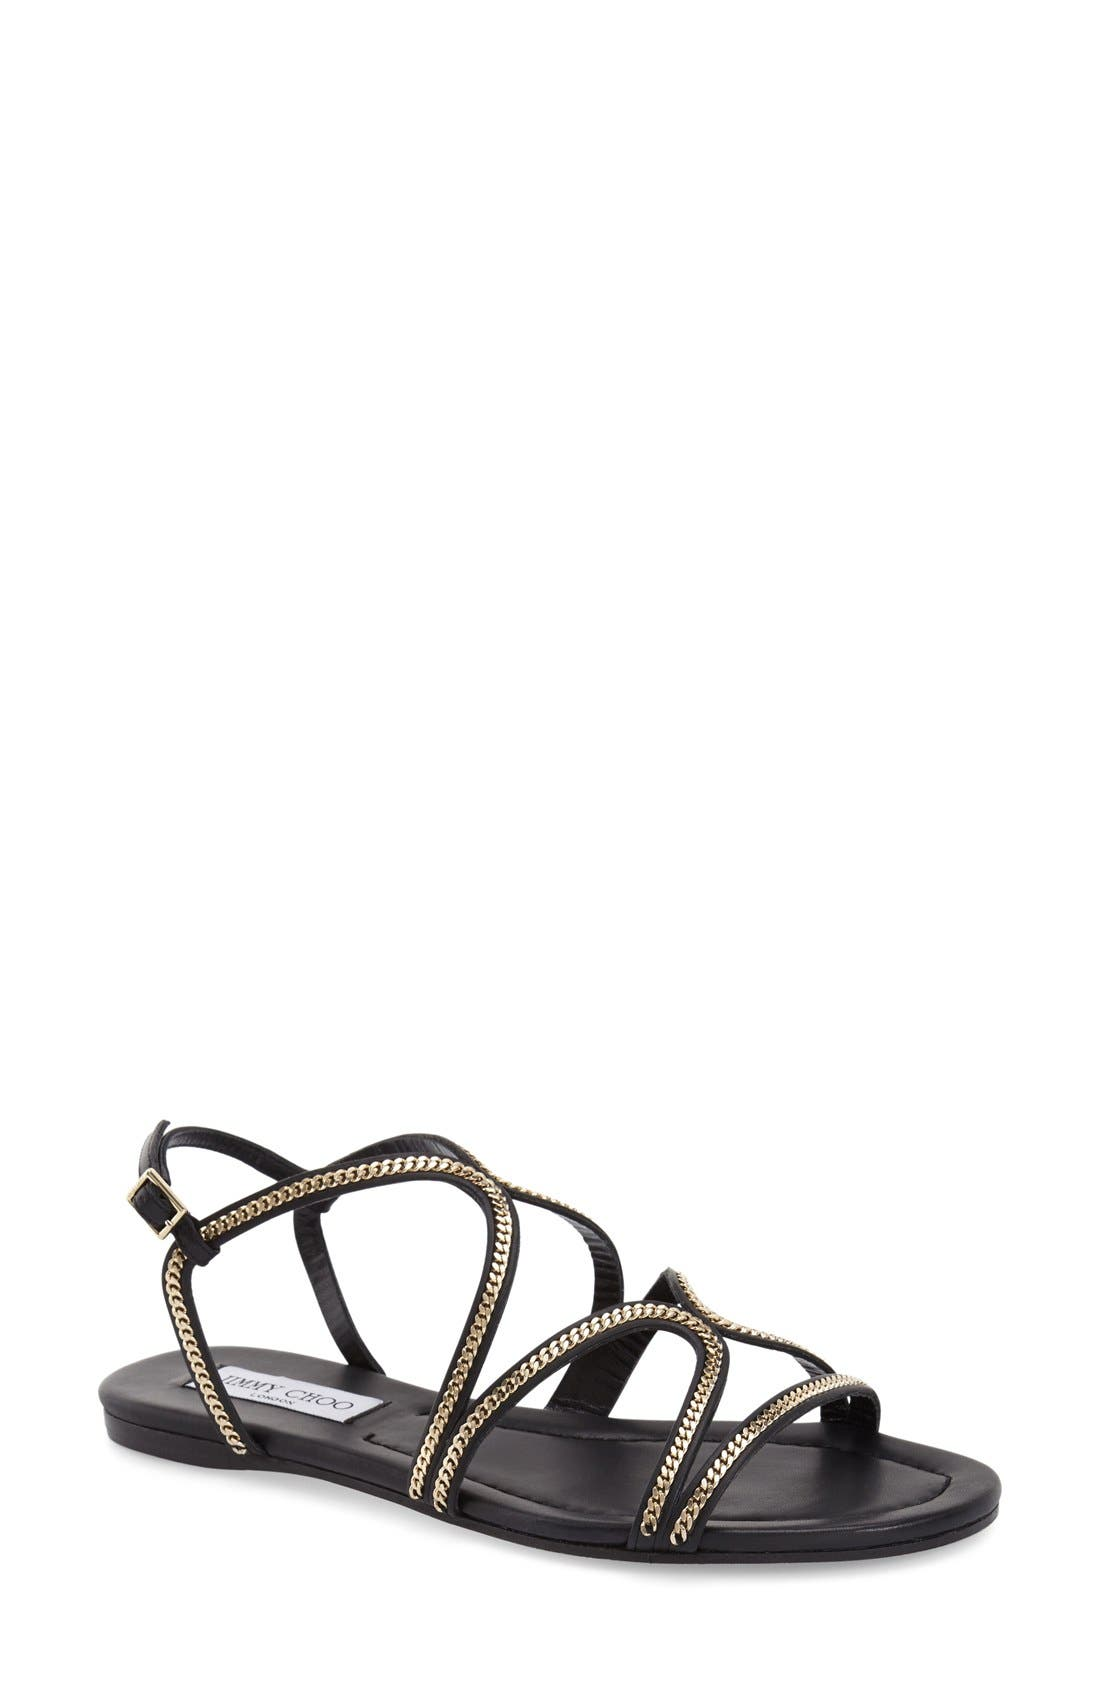 'Nickel' Sandal,                             Main thumbnail 1, color,                             Black Leather